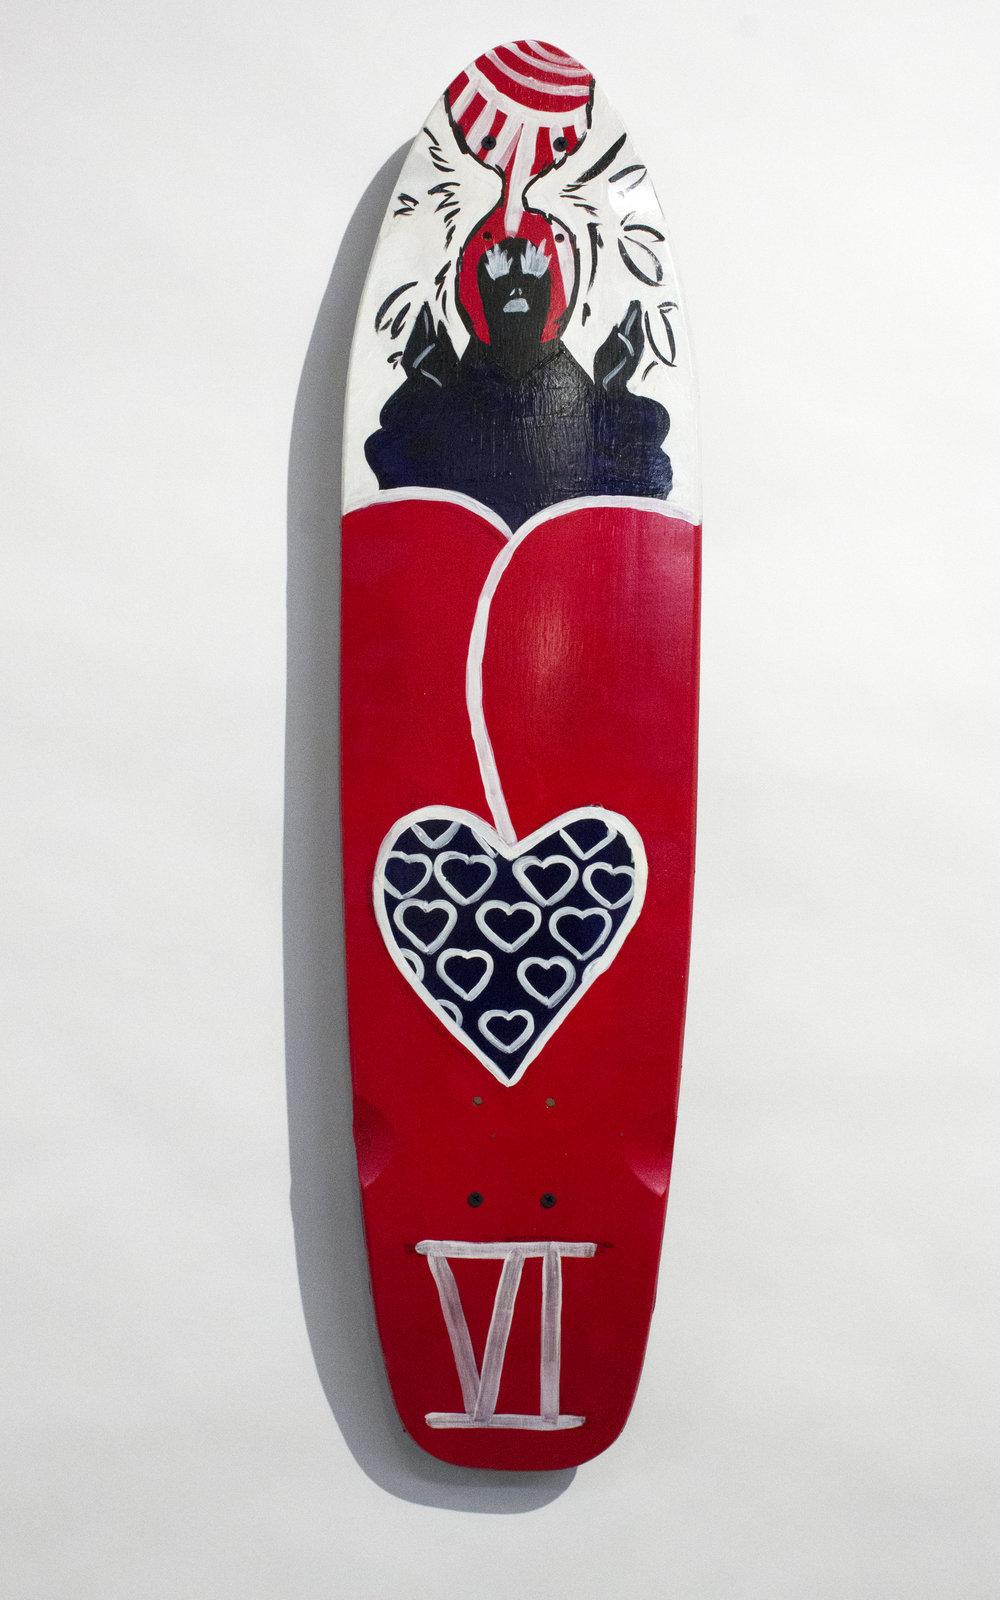 Lovers: VI Hearts